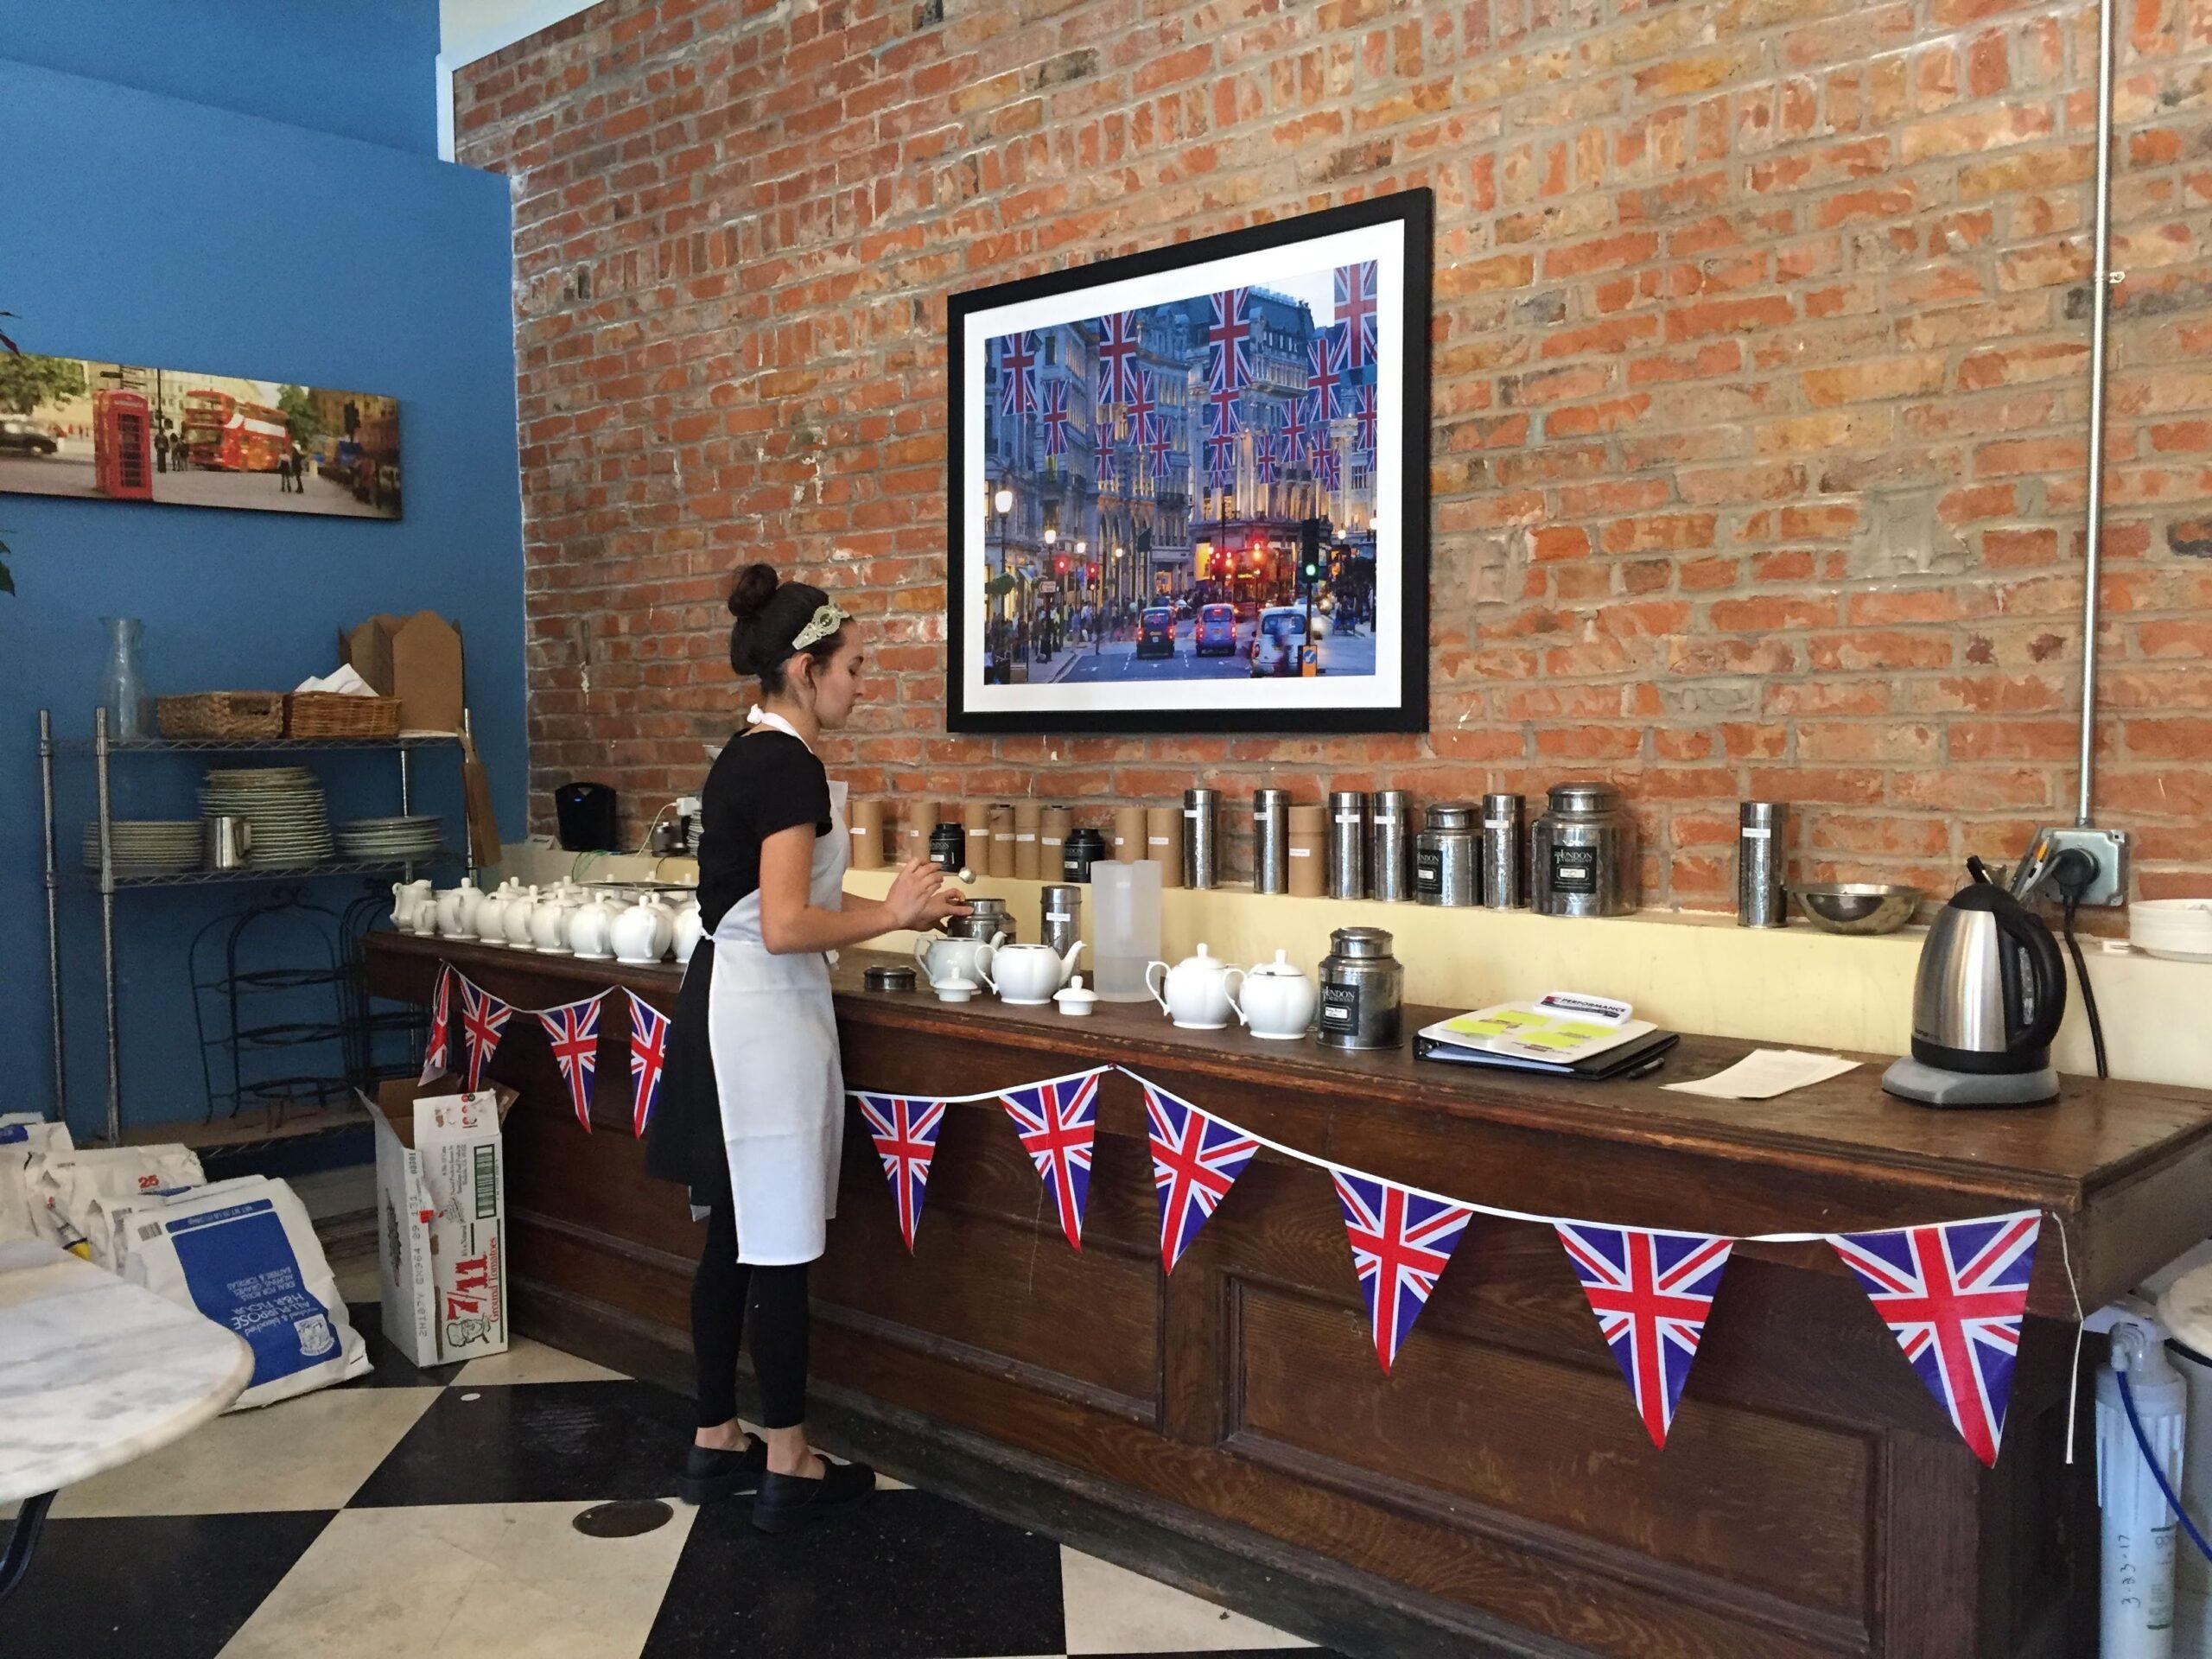 The London Tea Room